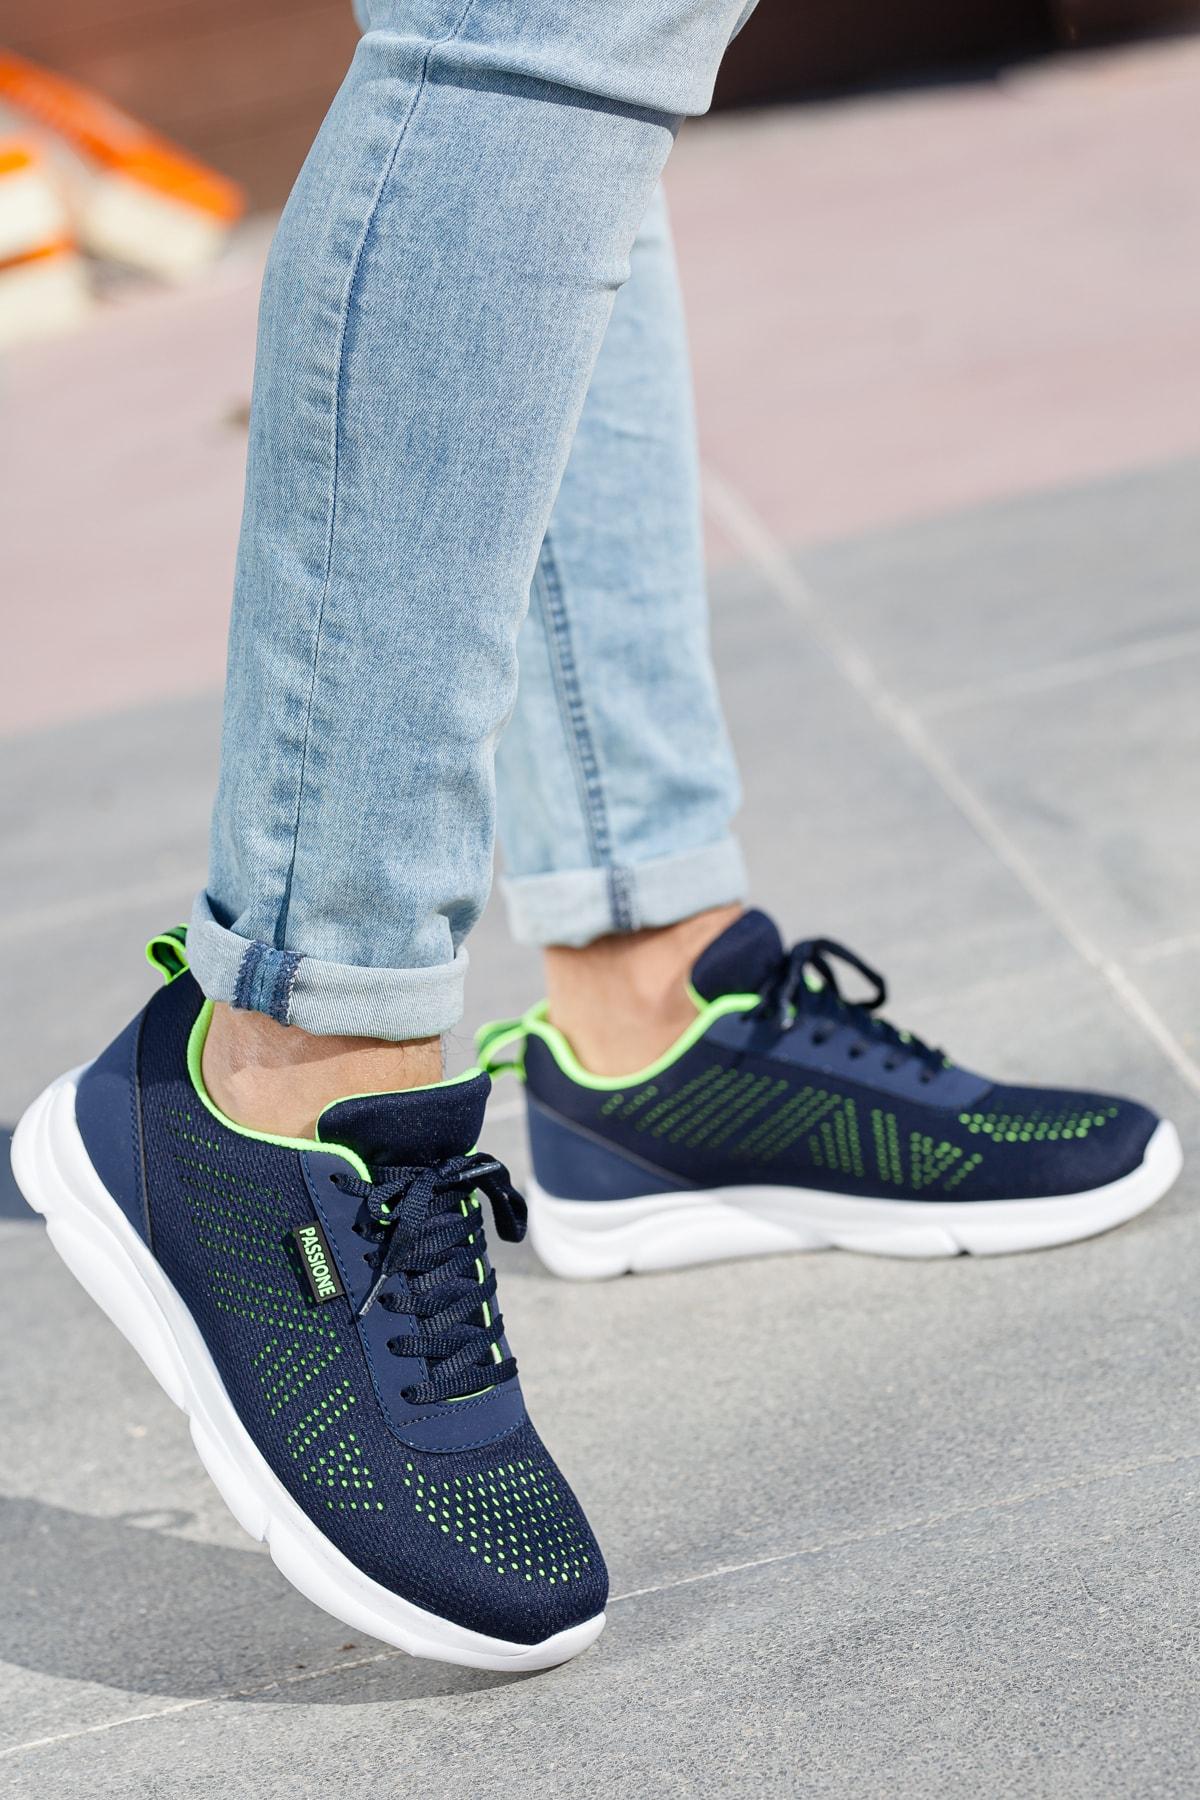 MUGGO Unisex Sneakers Ayakkabı 1